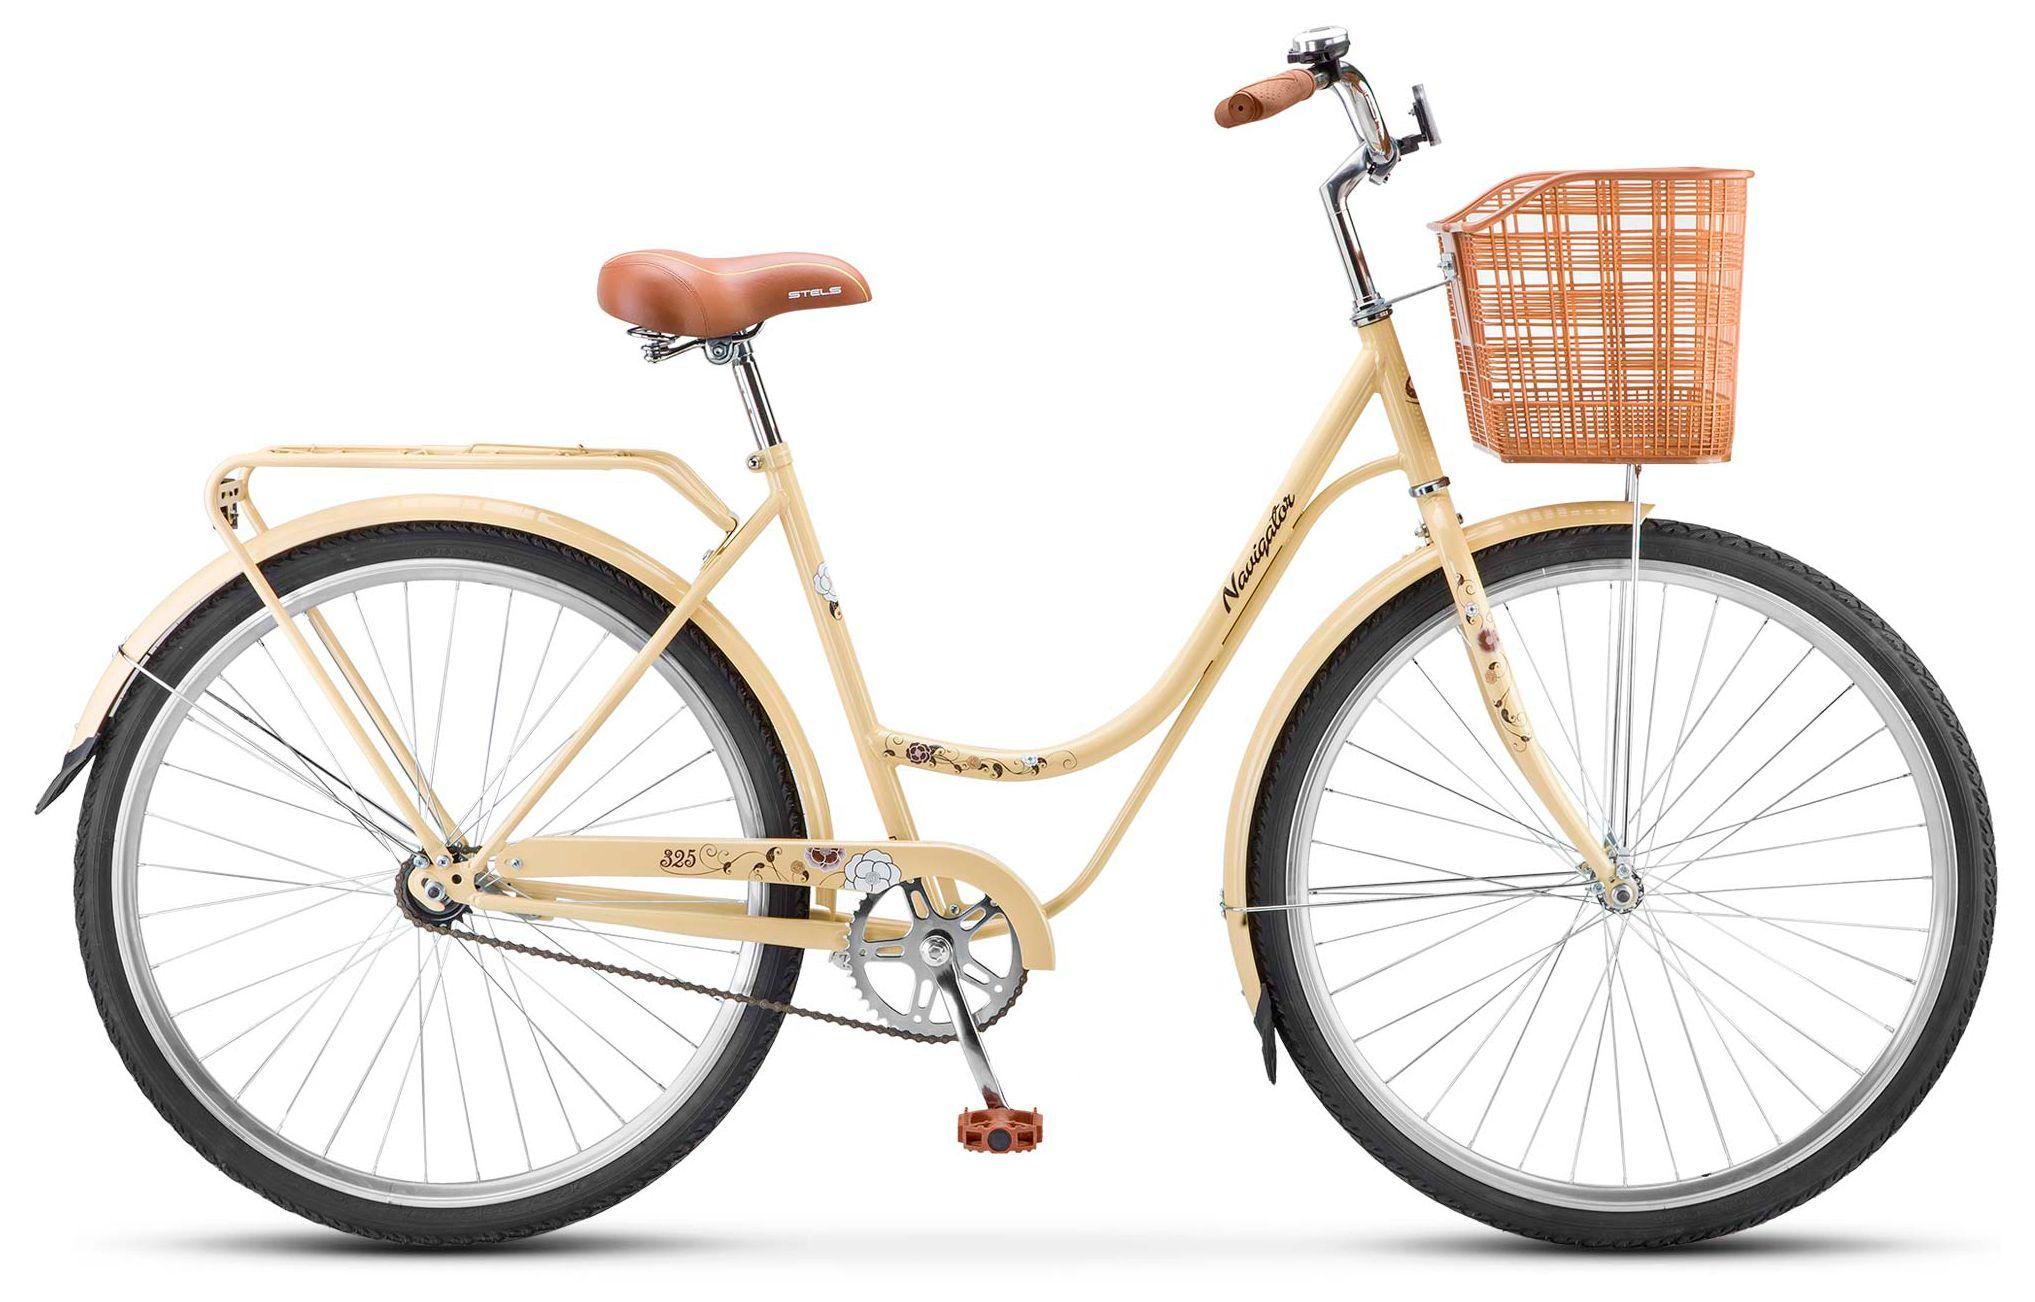 Велосипед Stels STELS Велосипед 2018 2018 велосипед stels adrenalin disc 2014